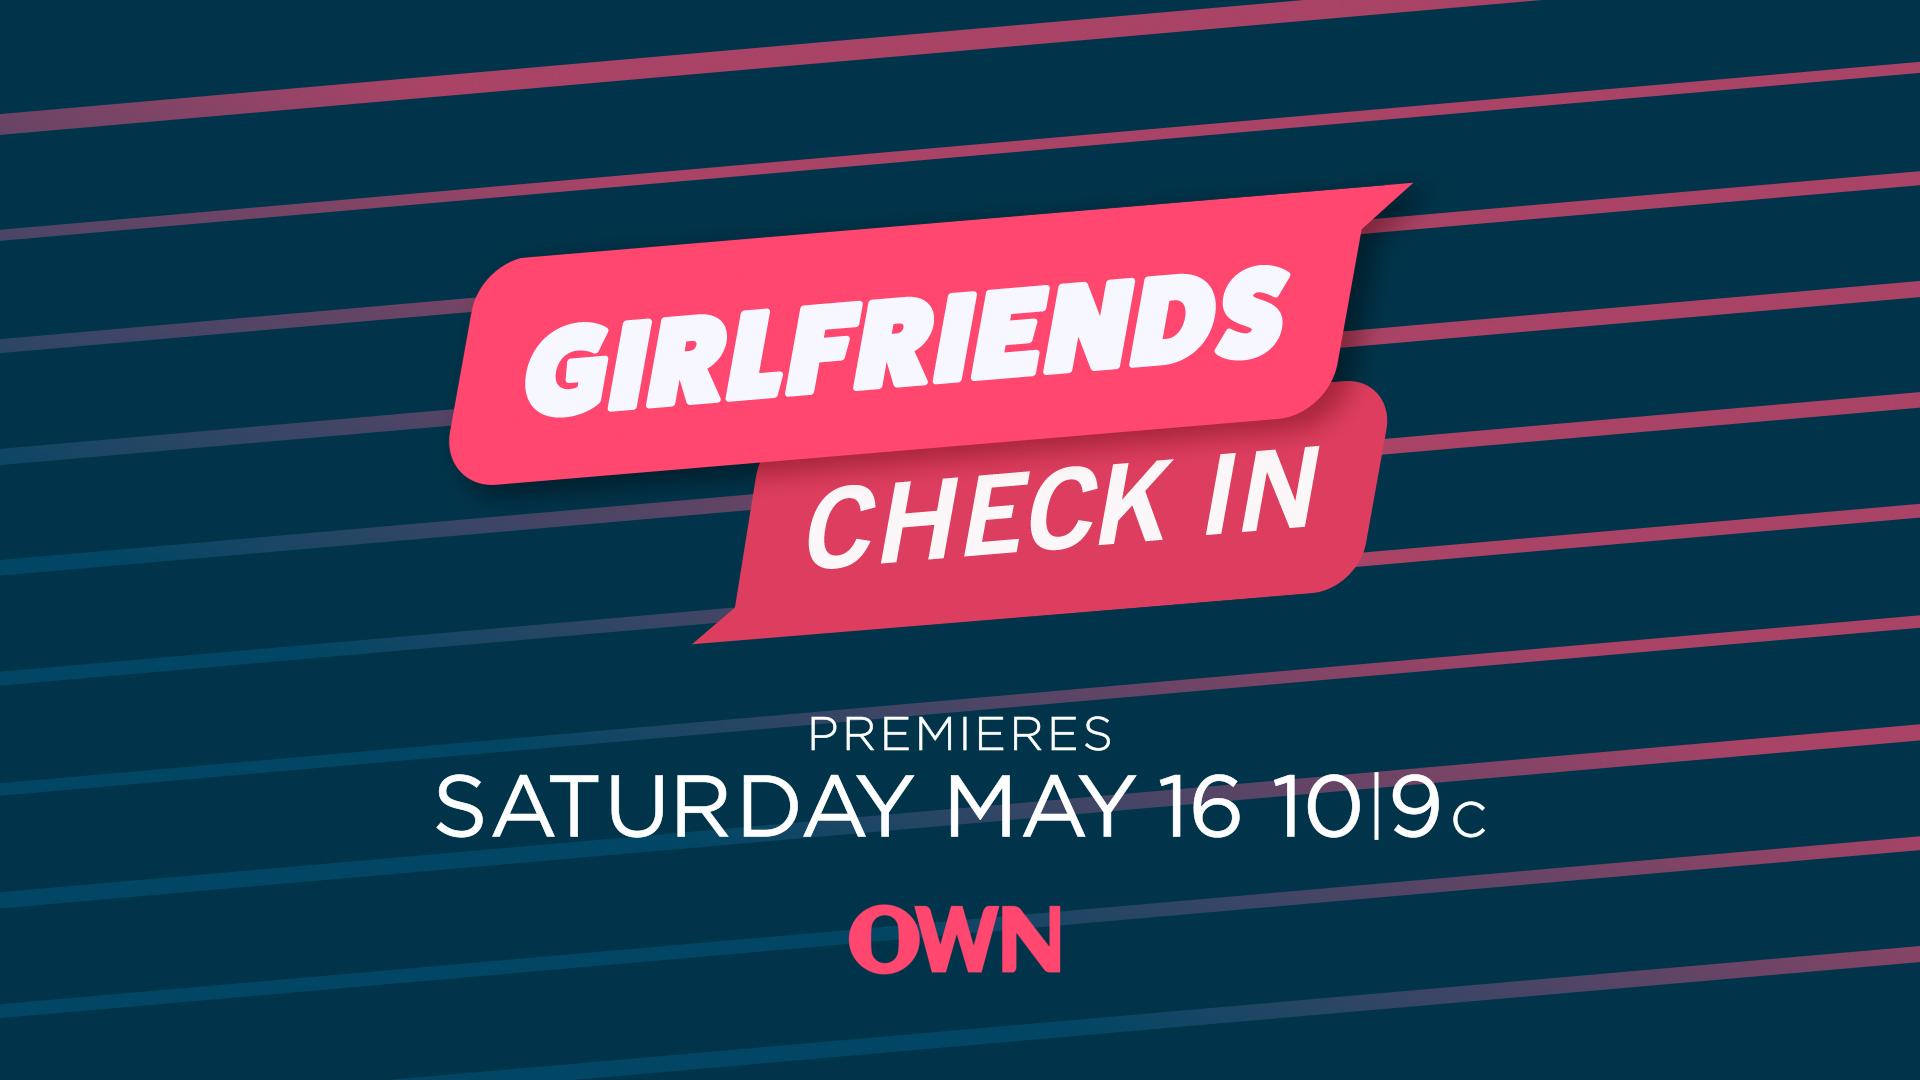 girlfriends check in logo